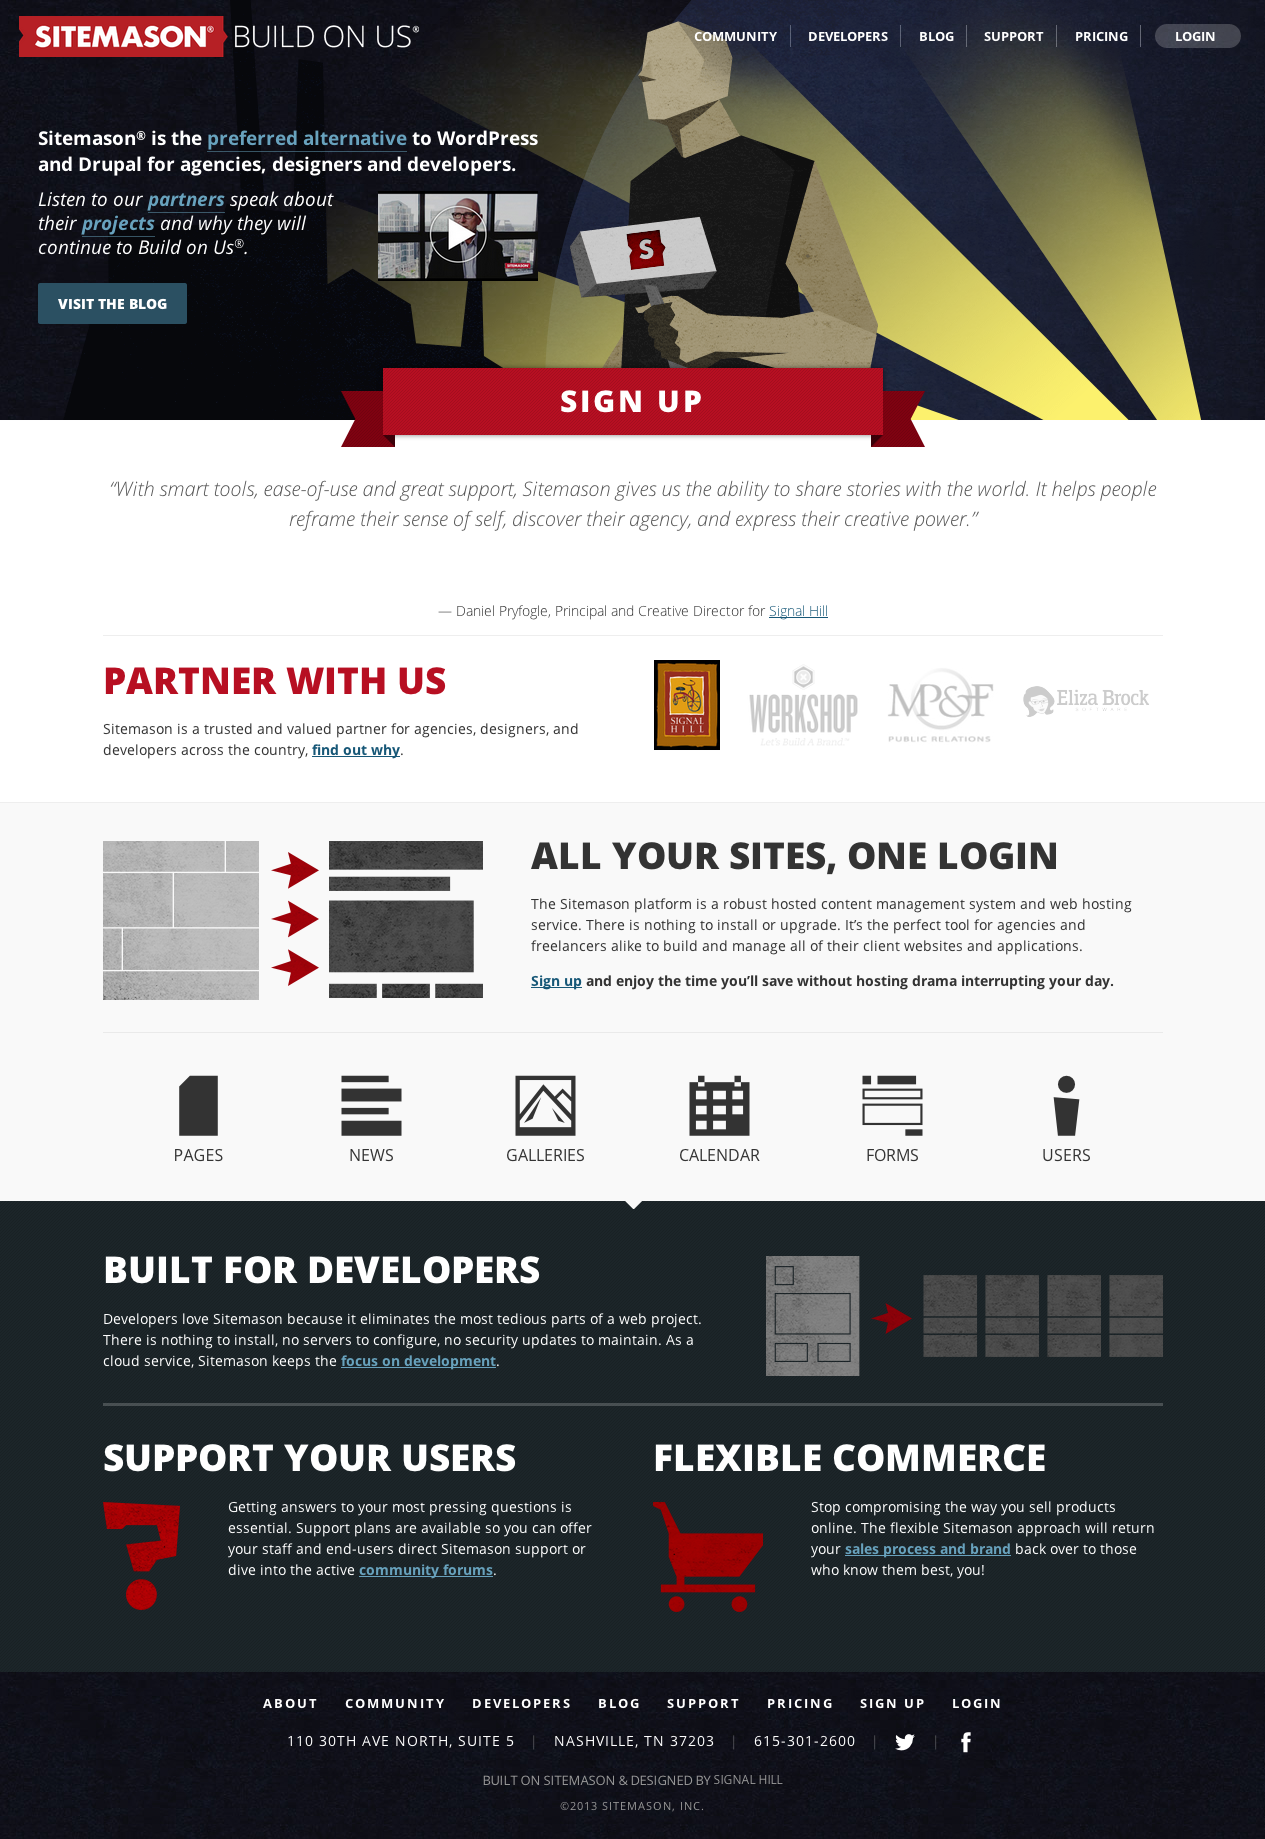 Sitemason Website